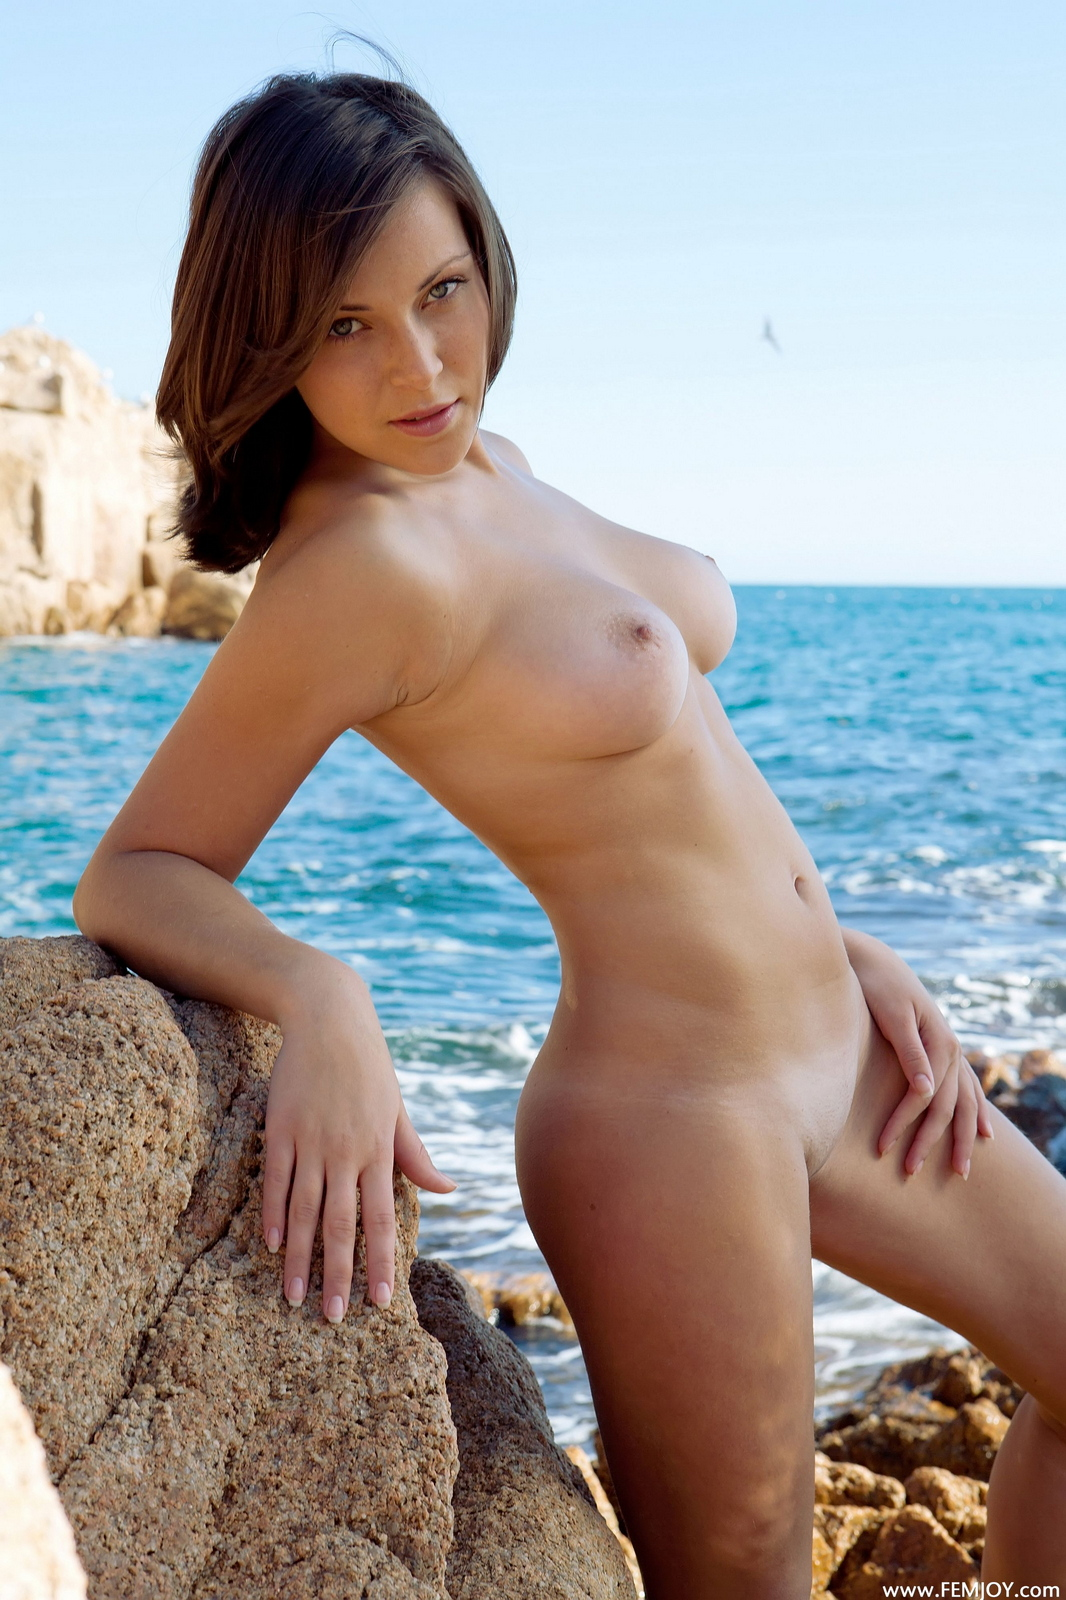 sophia-h-seaside-naked-boobs-rocks-femjoy-12